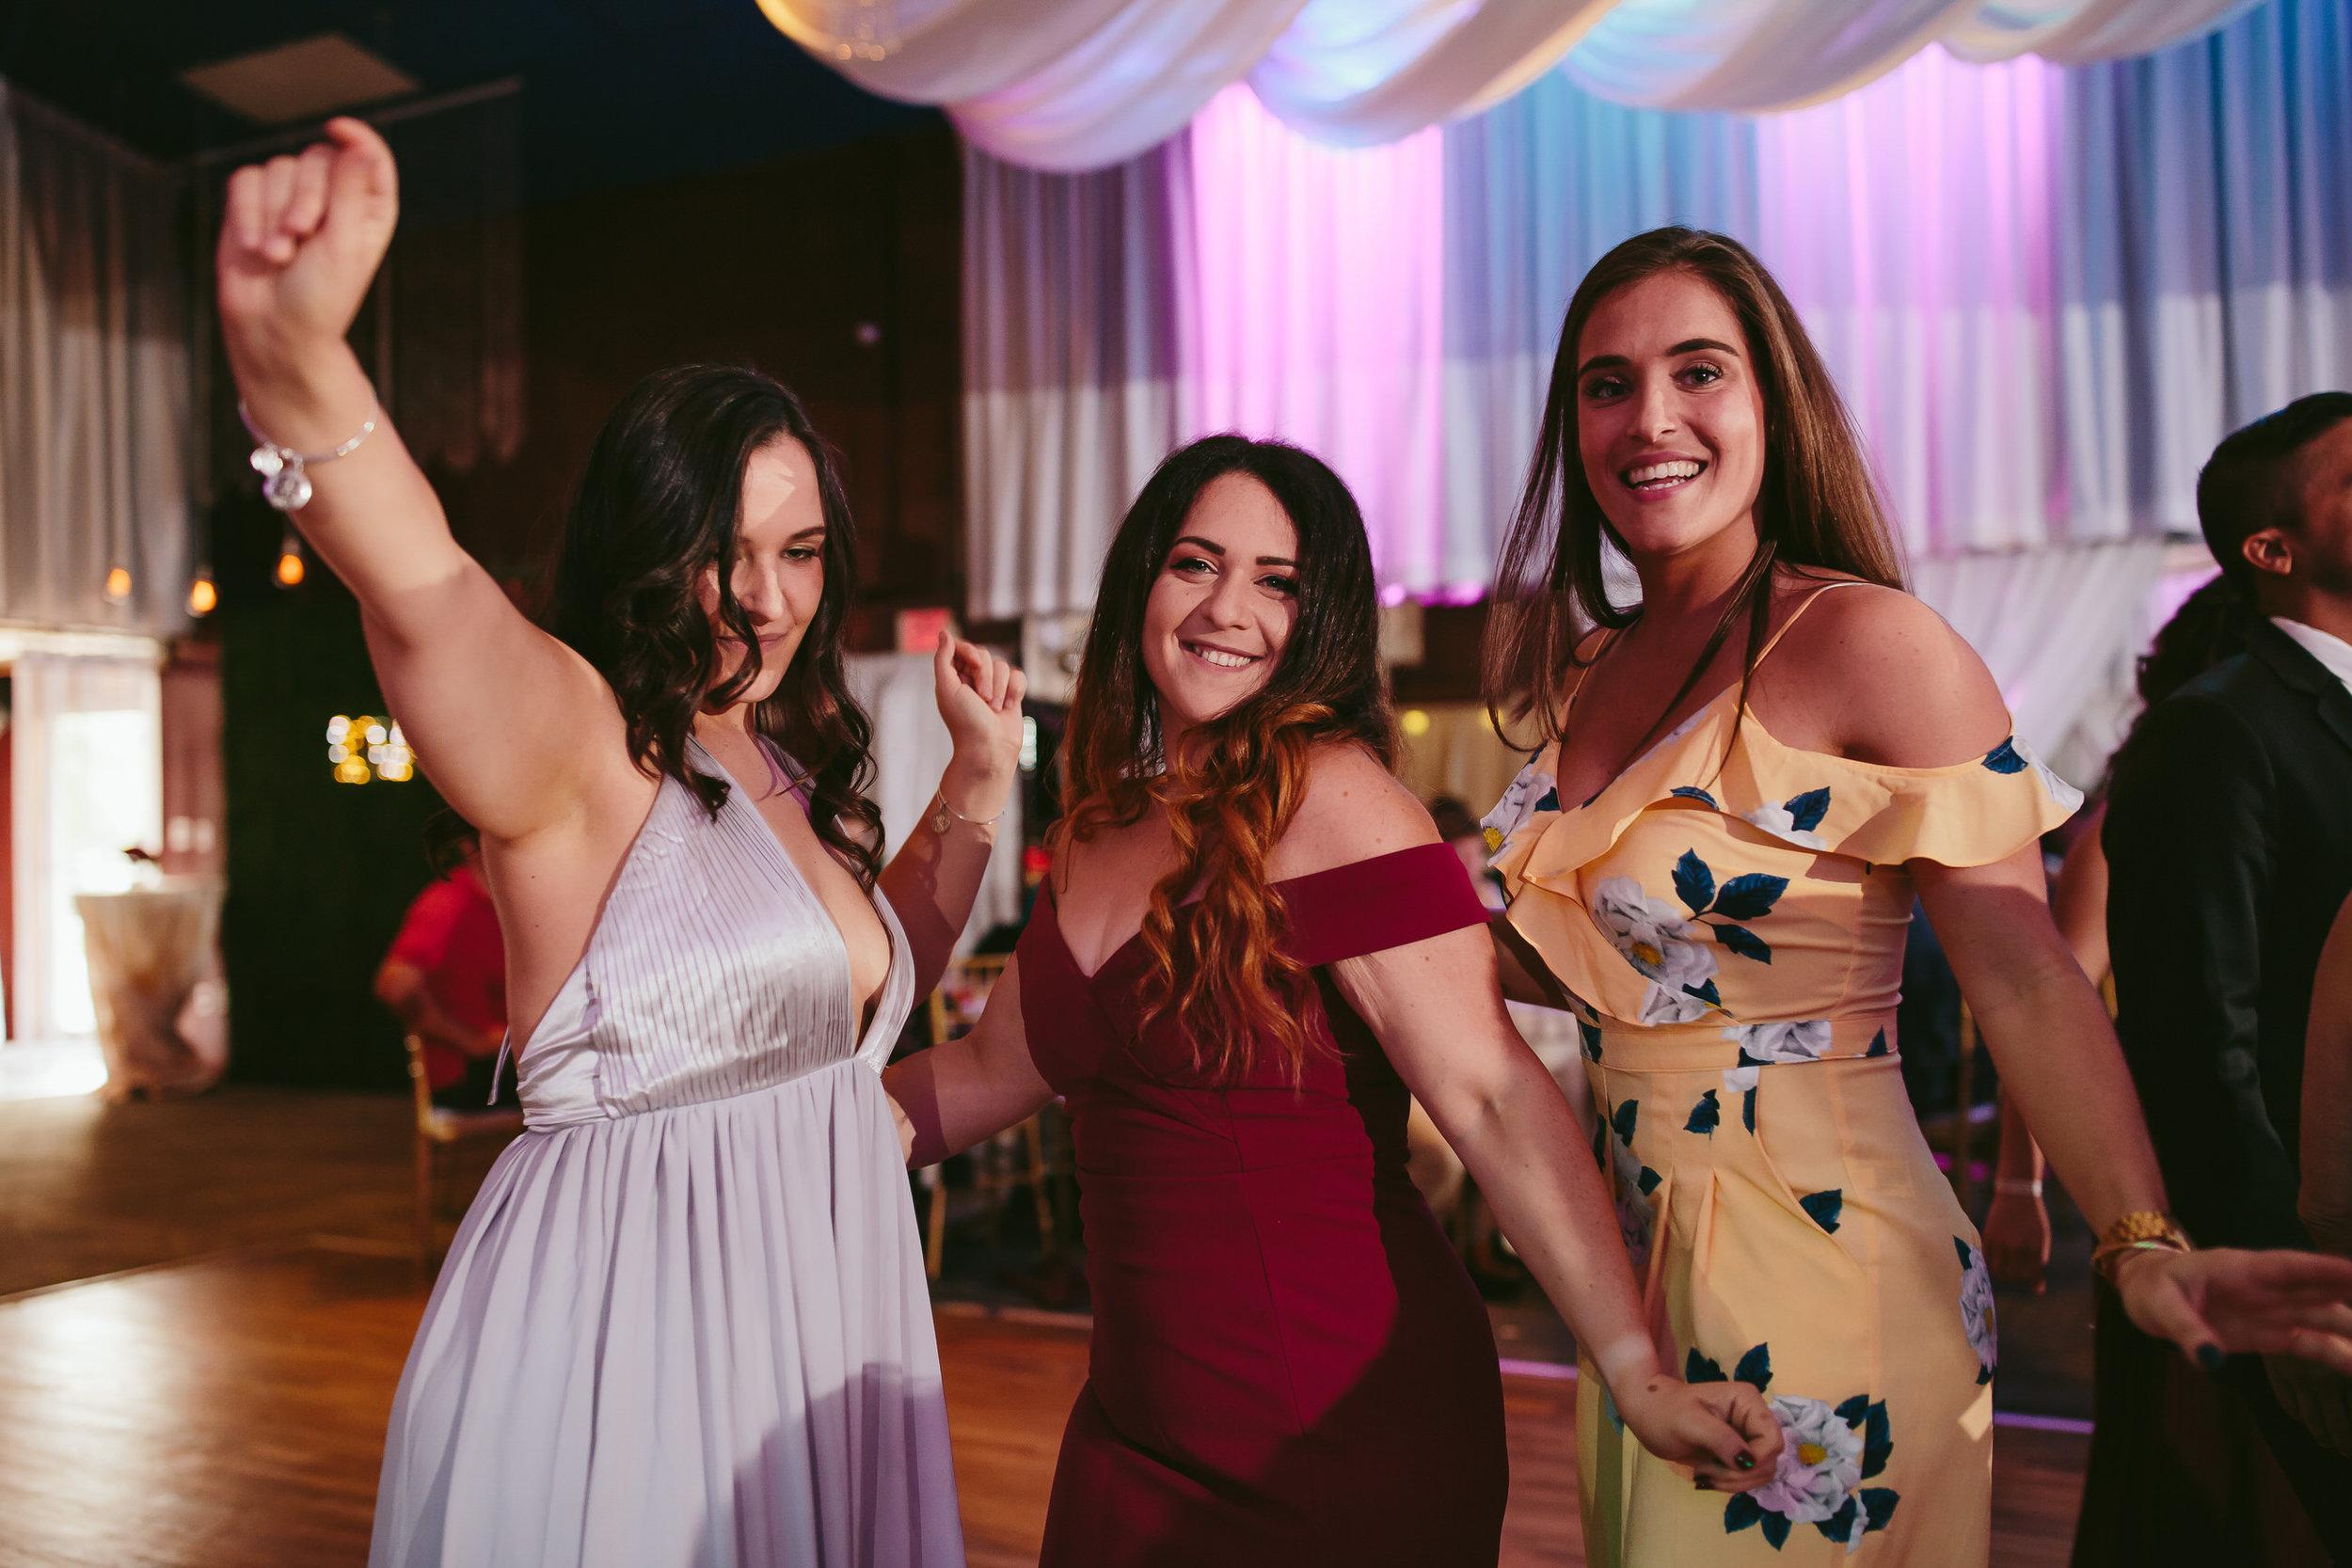 girls_dancing_tiny_house_photo_weddings.jpg